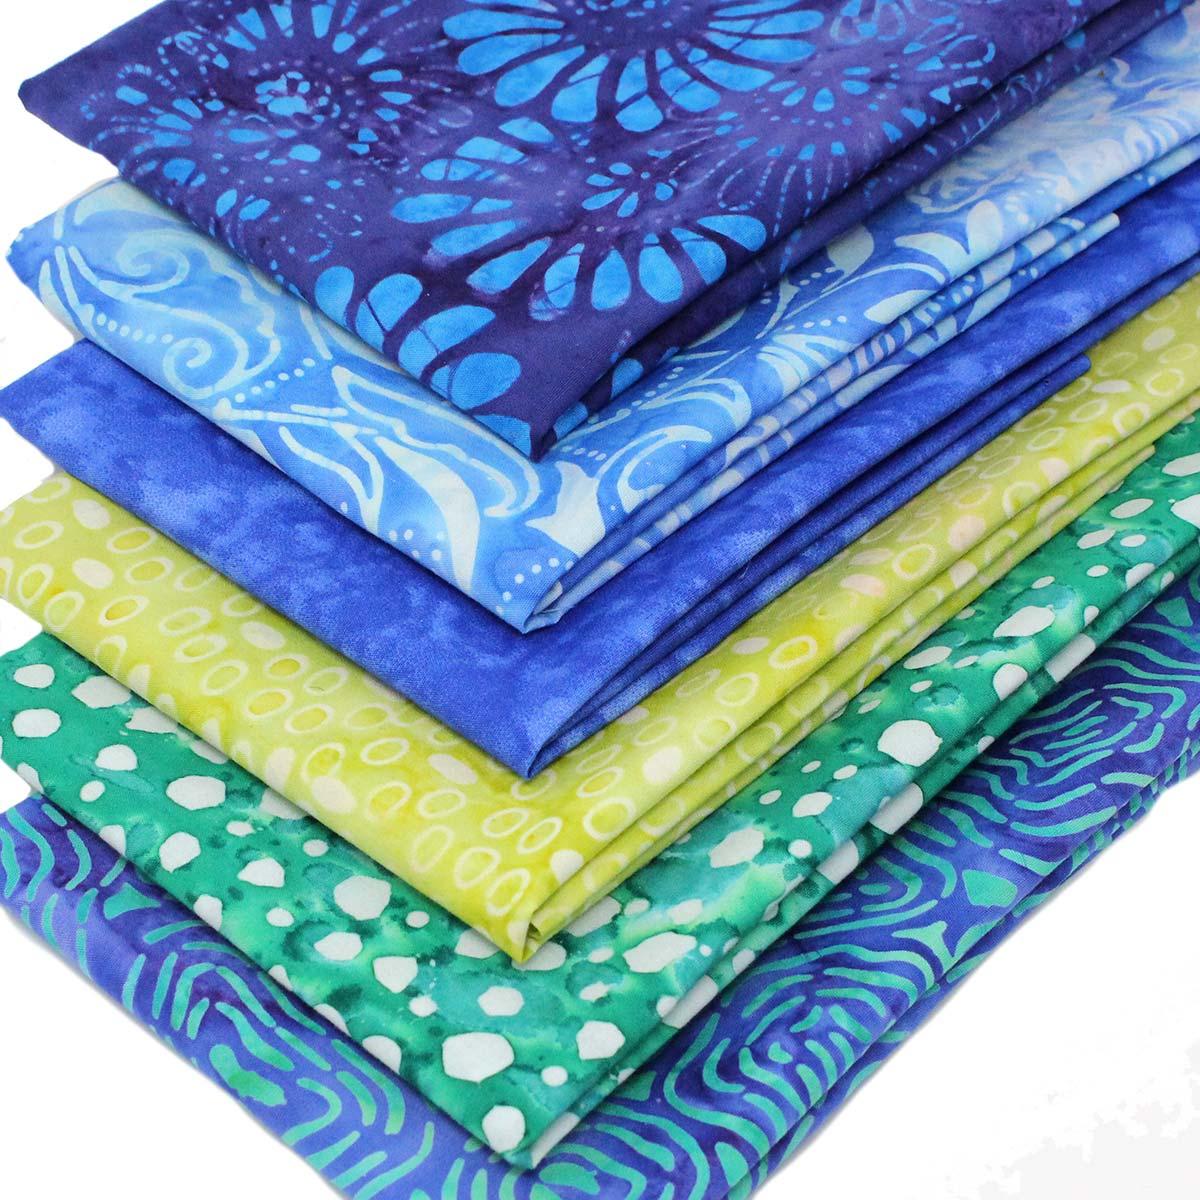 Fat Quarter Pack x 6 Batik Cotton Quilting Craft Fabric Bundles Blue Orange